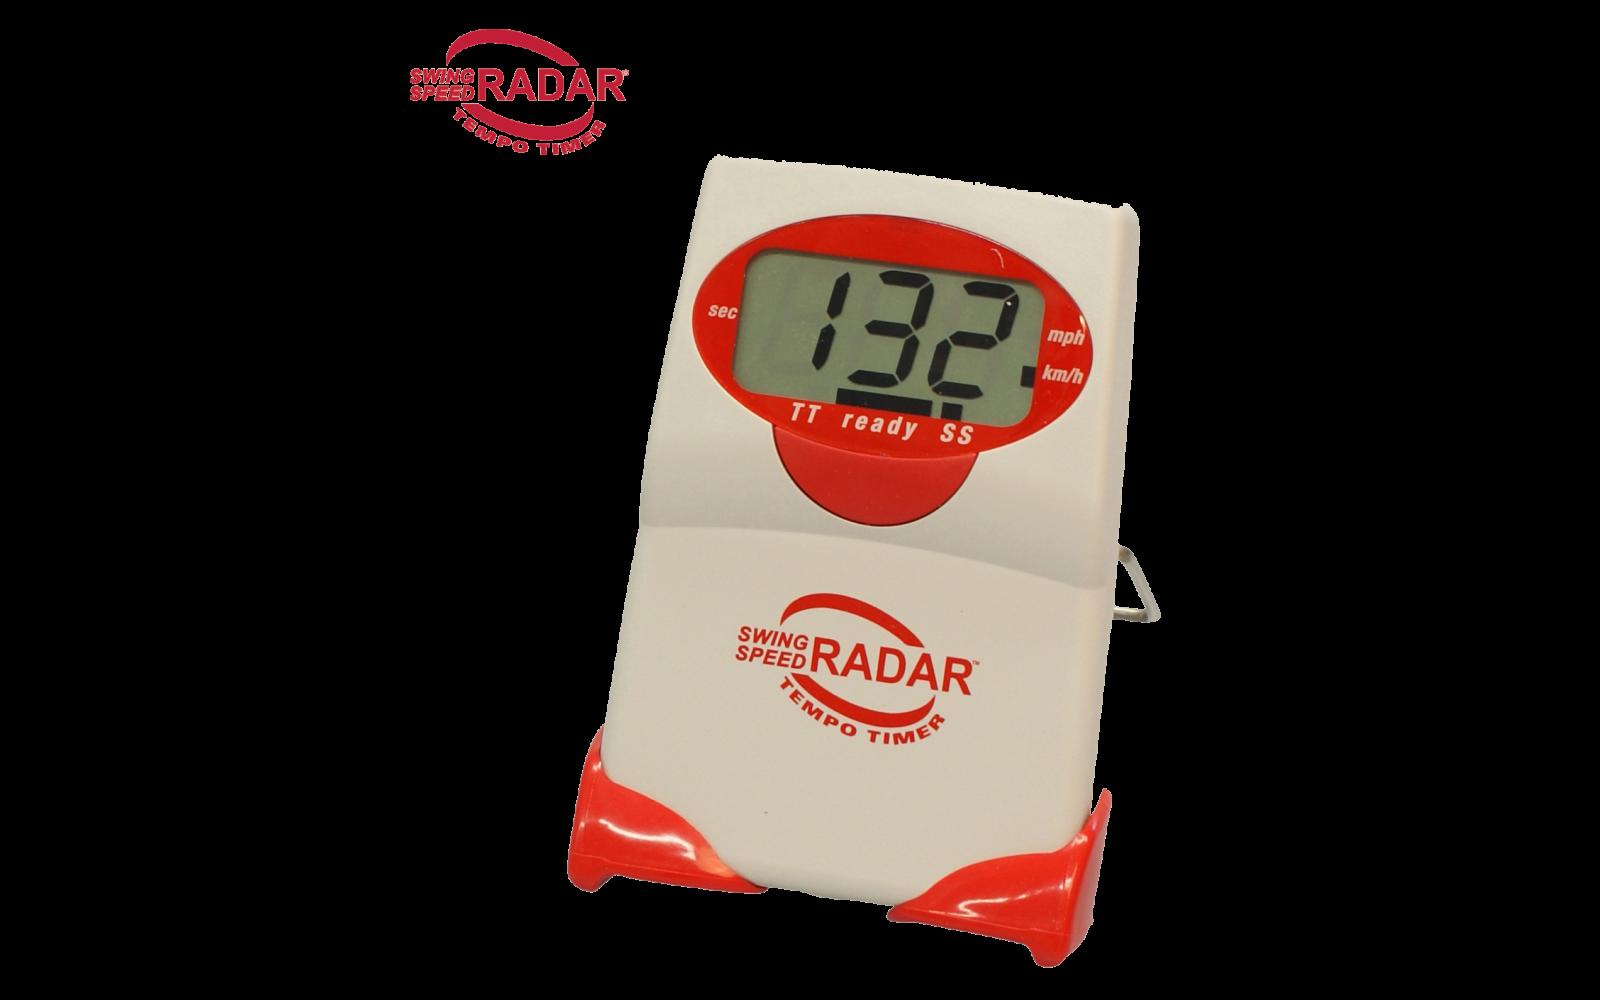 Swing Speed Radar Tempo Timer